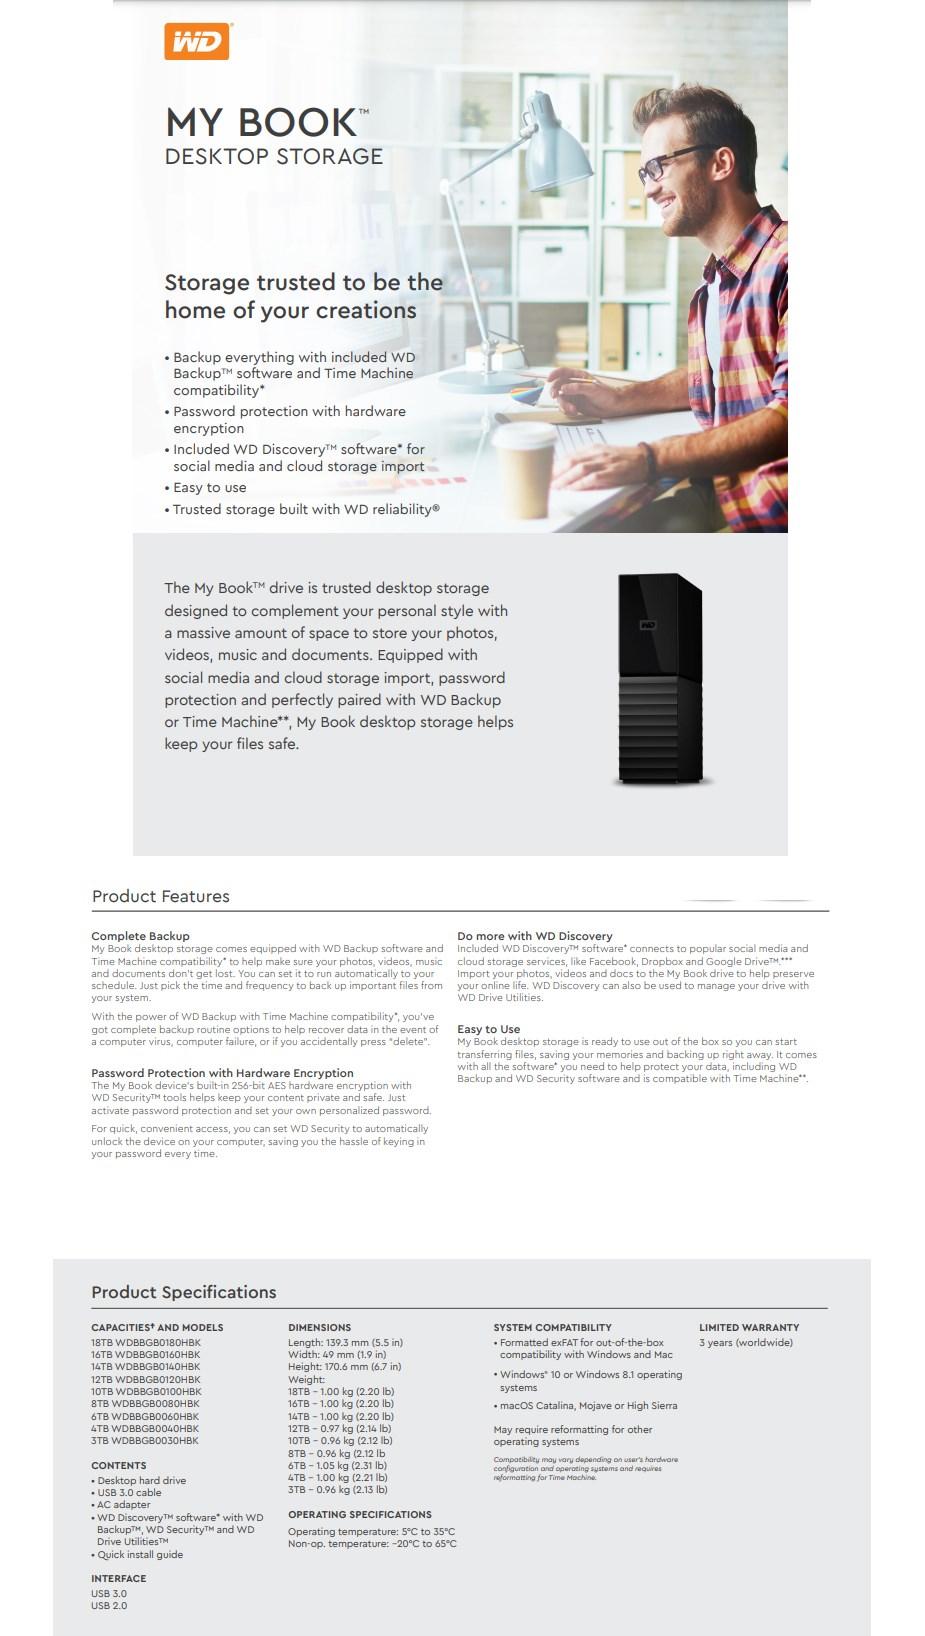 WD My Book 12TB USB 3.0 External Desktop Hard Drive WDBBGB0120HBK-AESN - Overview 1